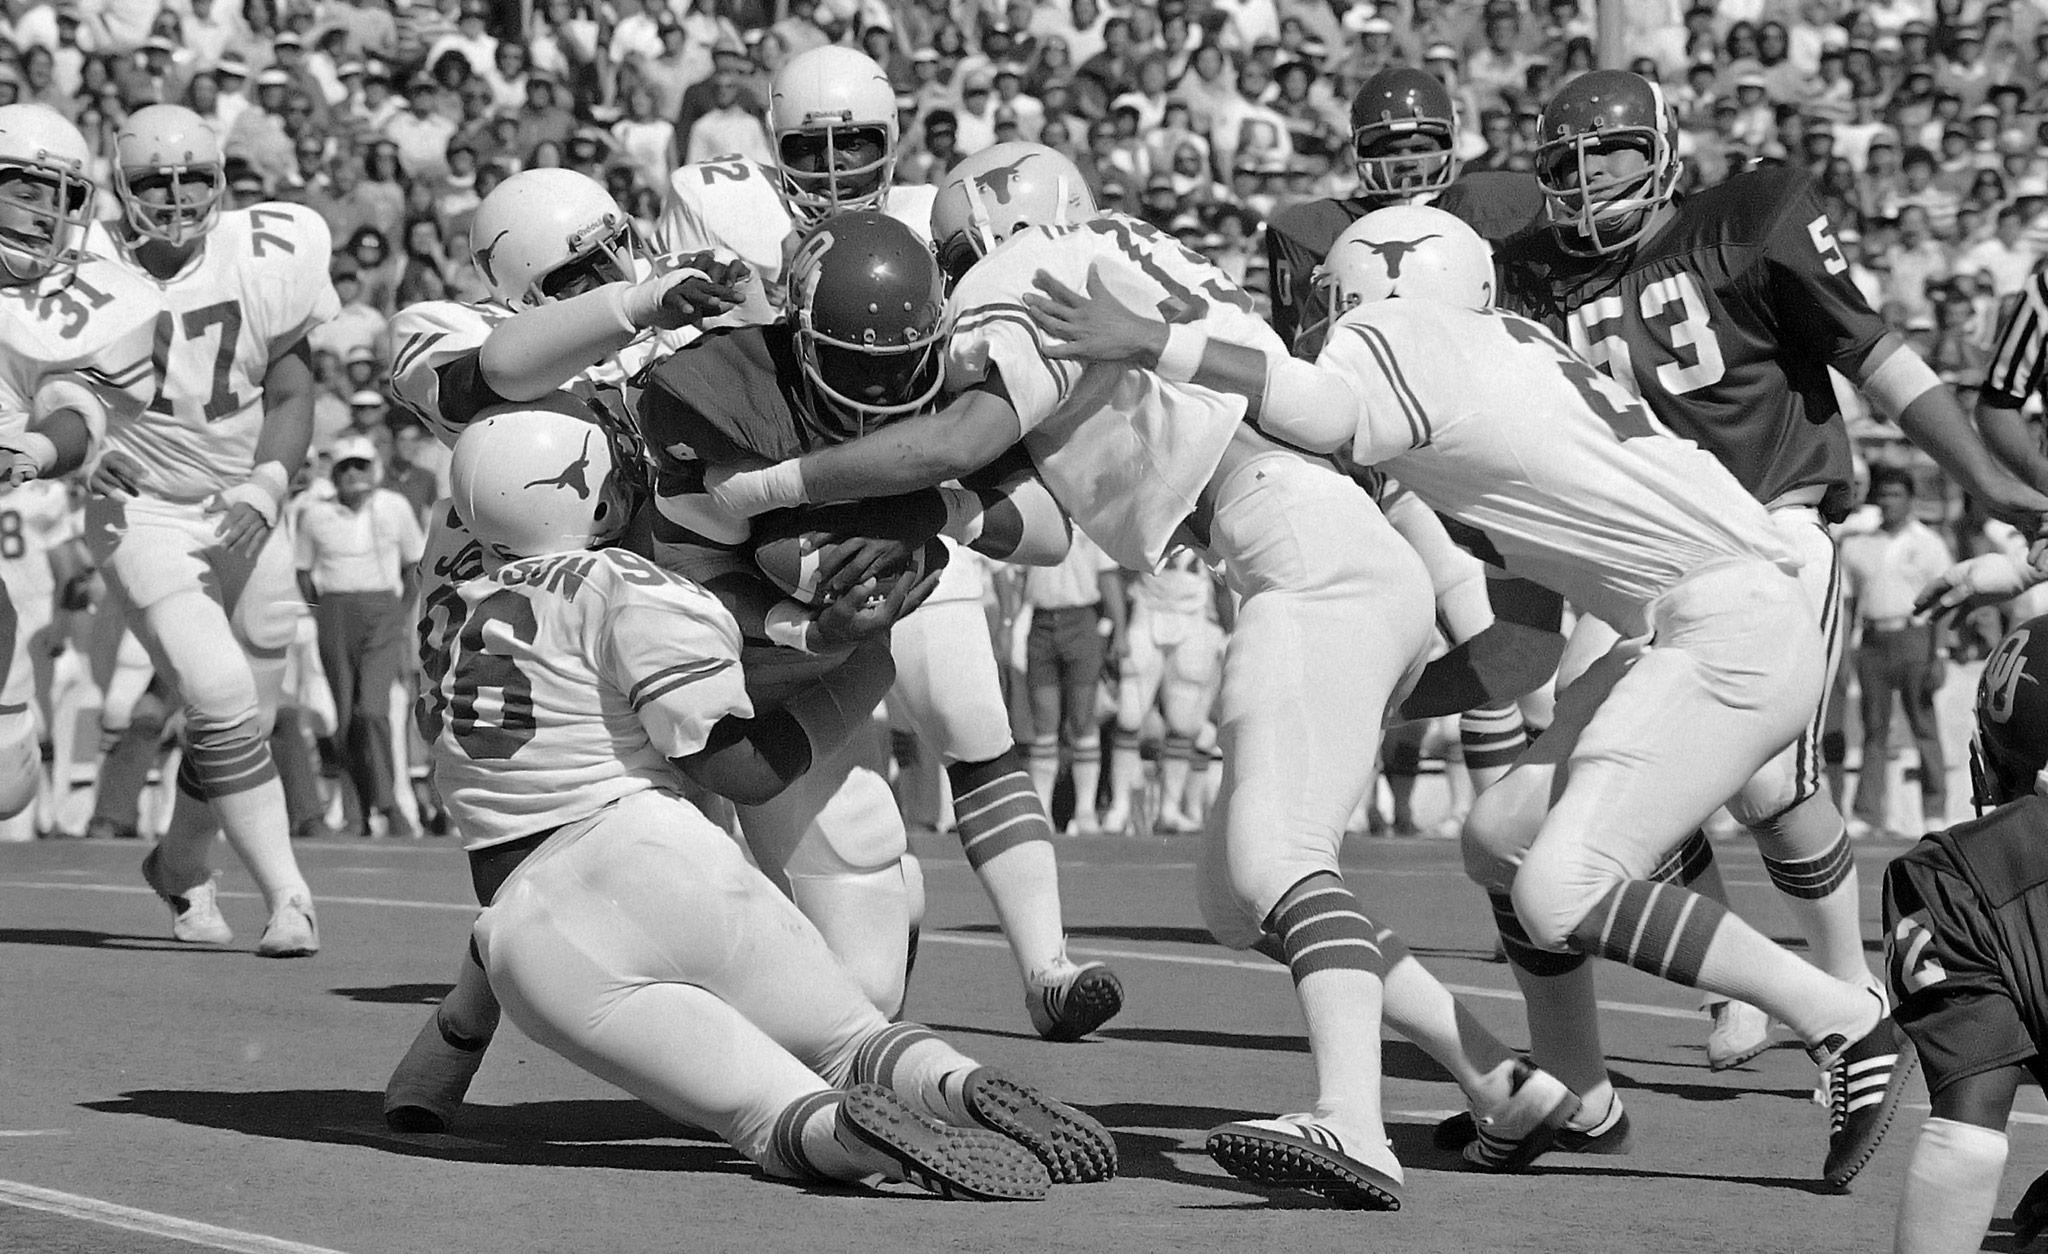 2013 florida state vs florida football upskirt 4 9